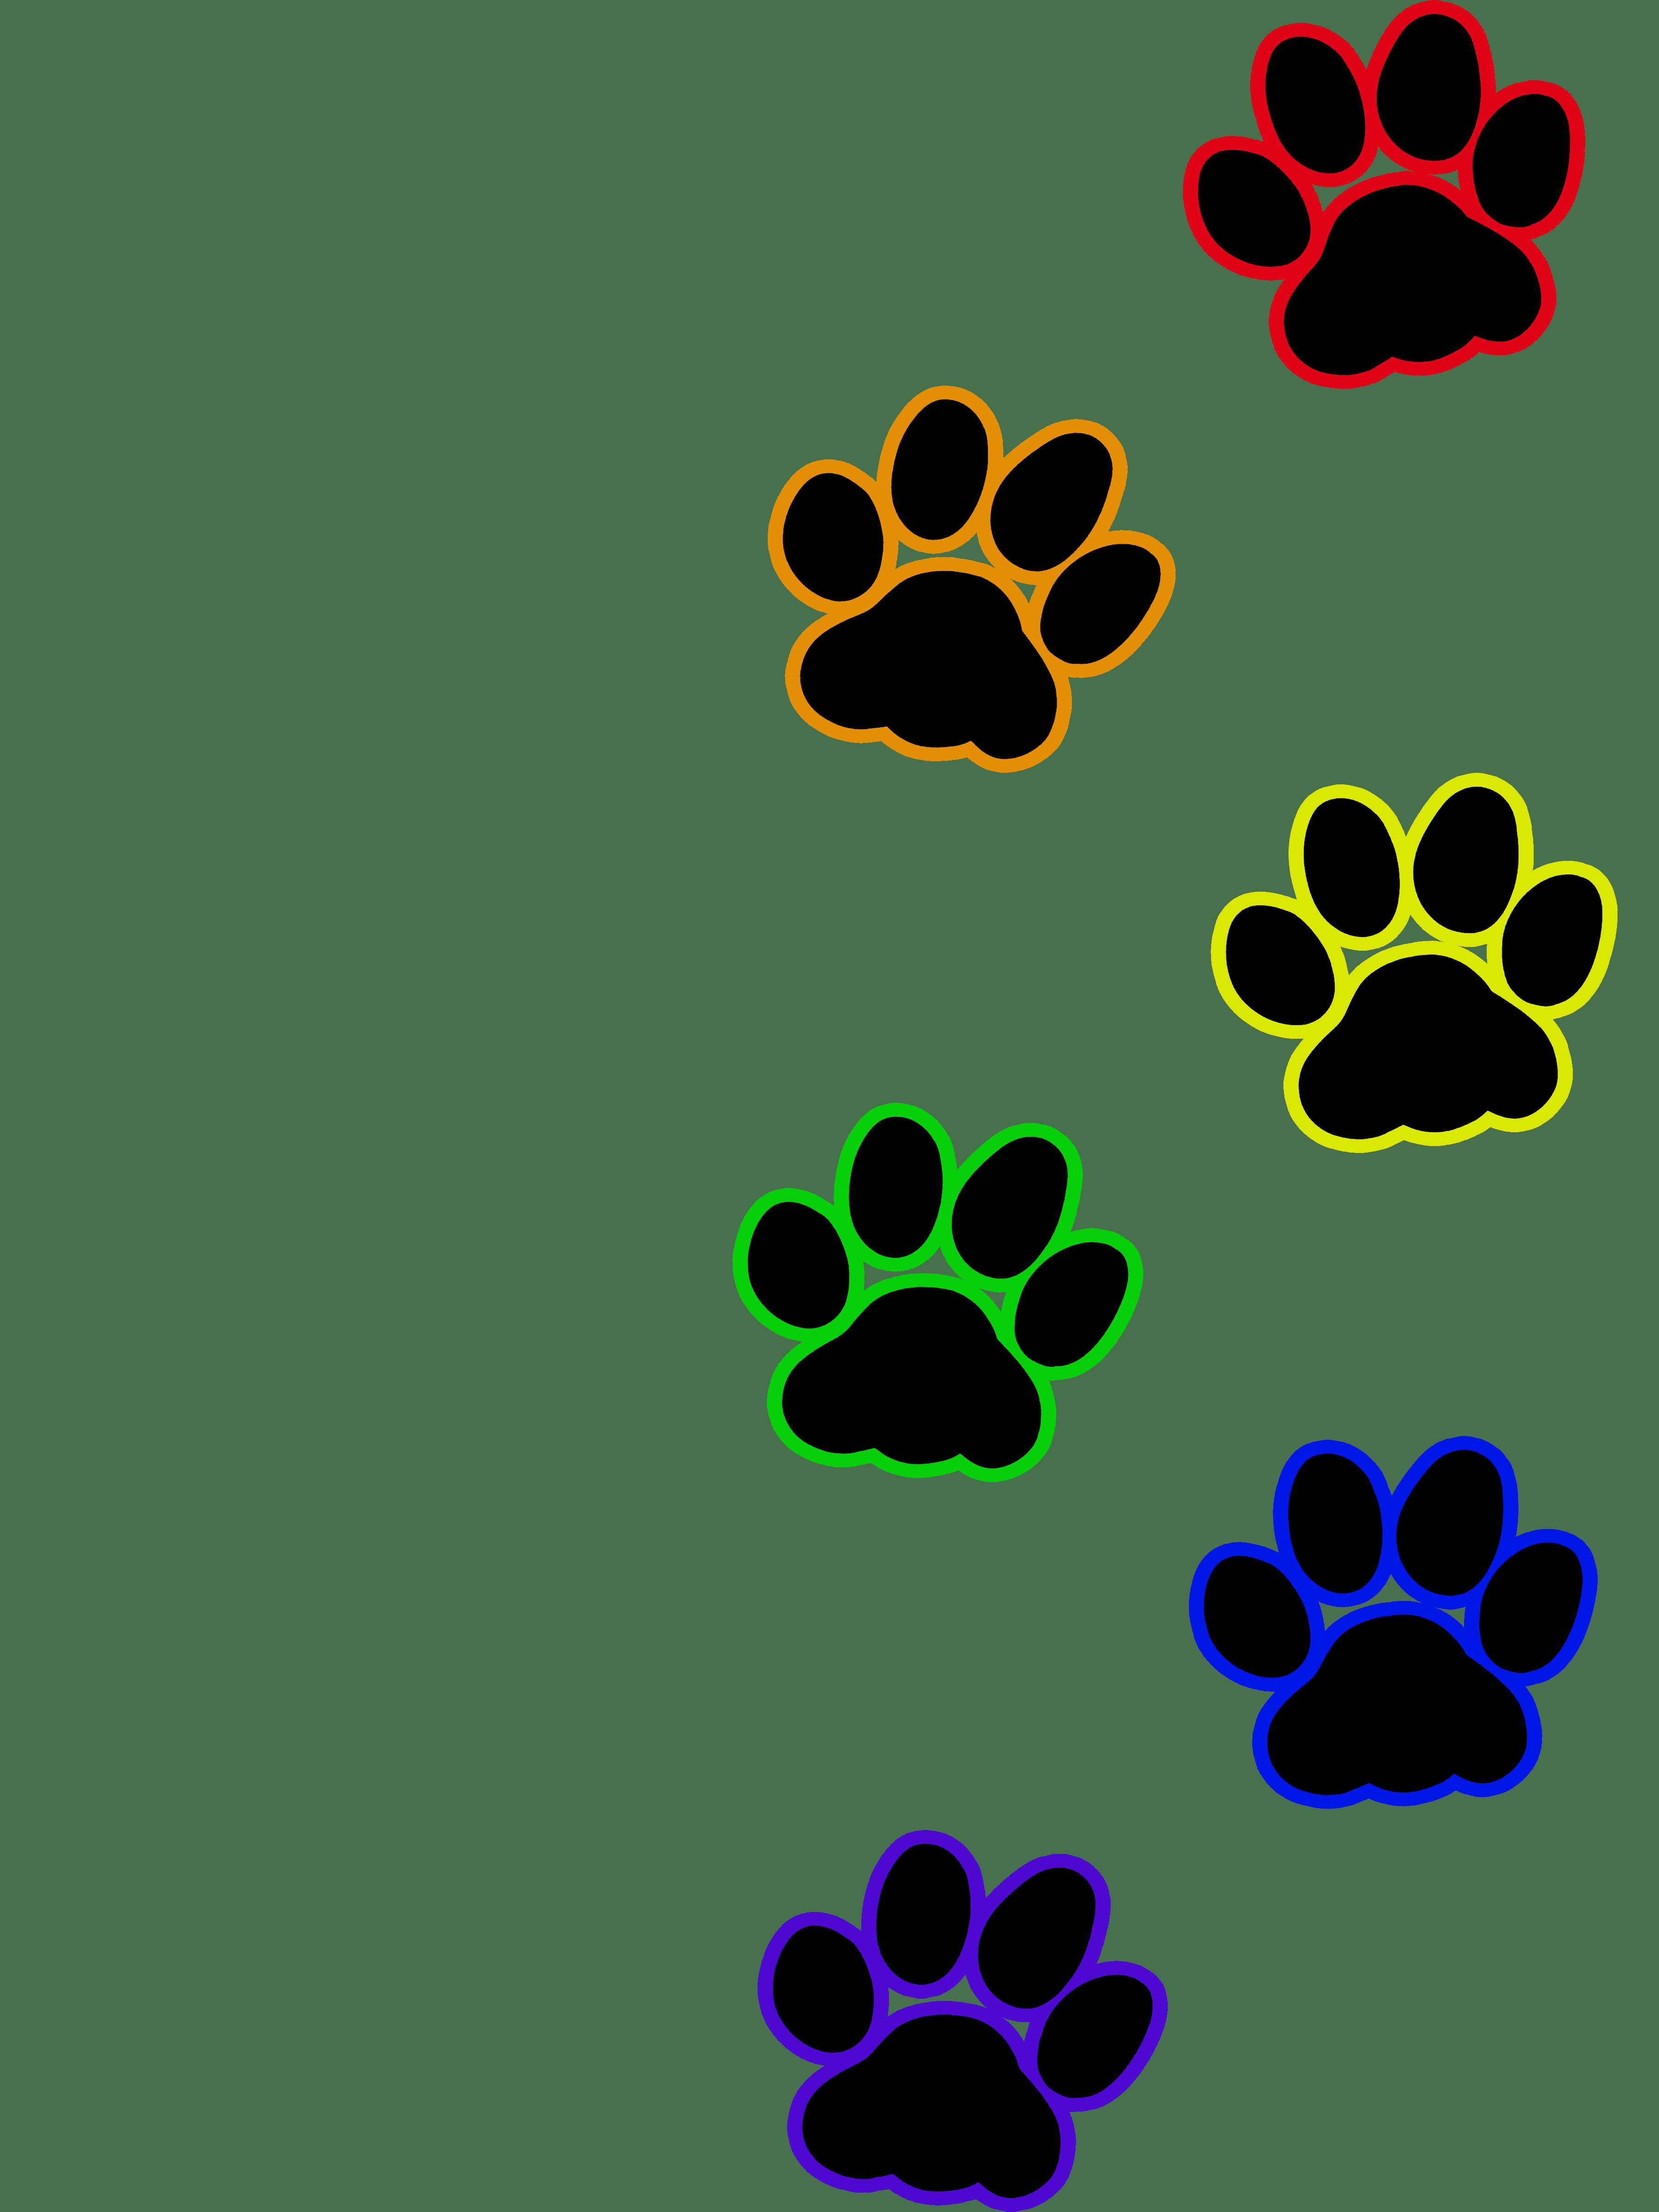 Paw clipart colourful. Cat print rainbow artworktee